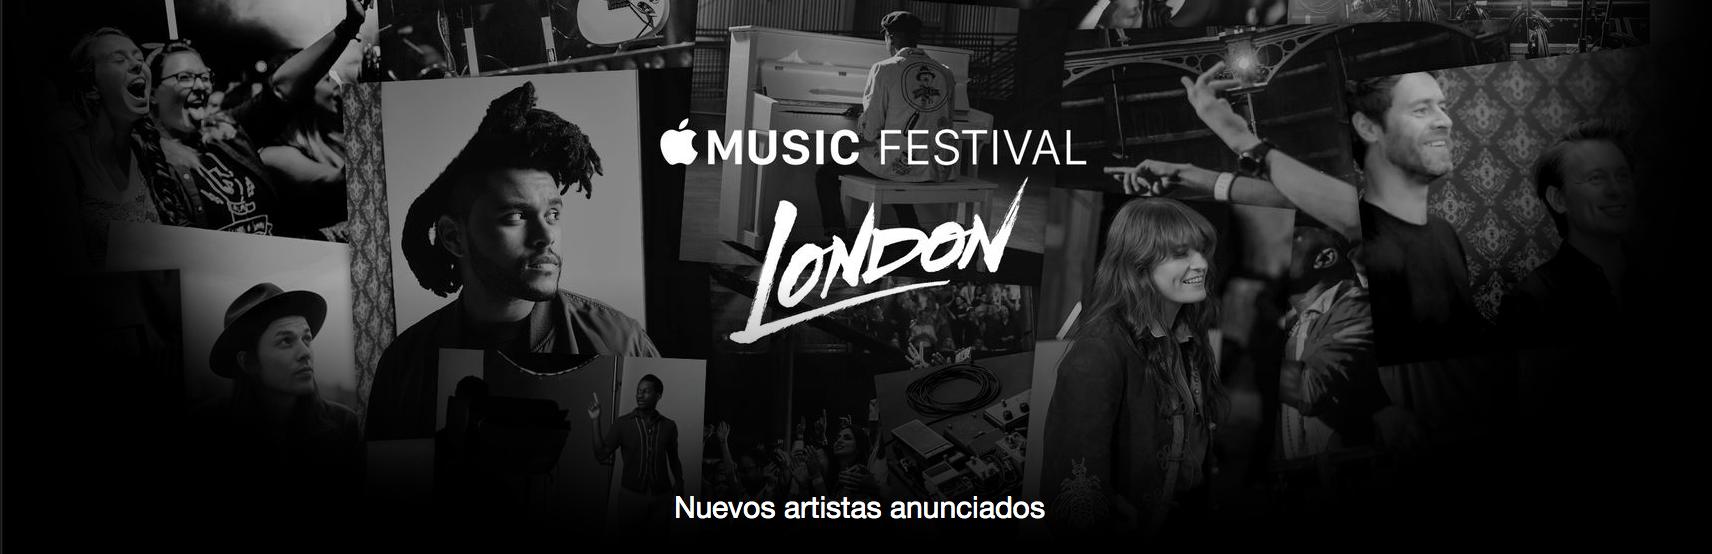 Apple Music Festival promo 2015